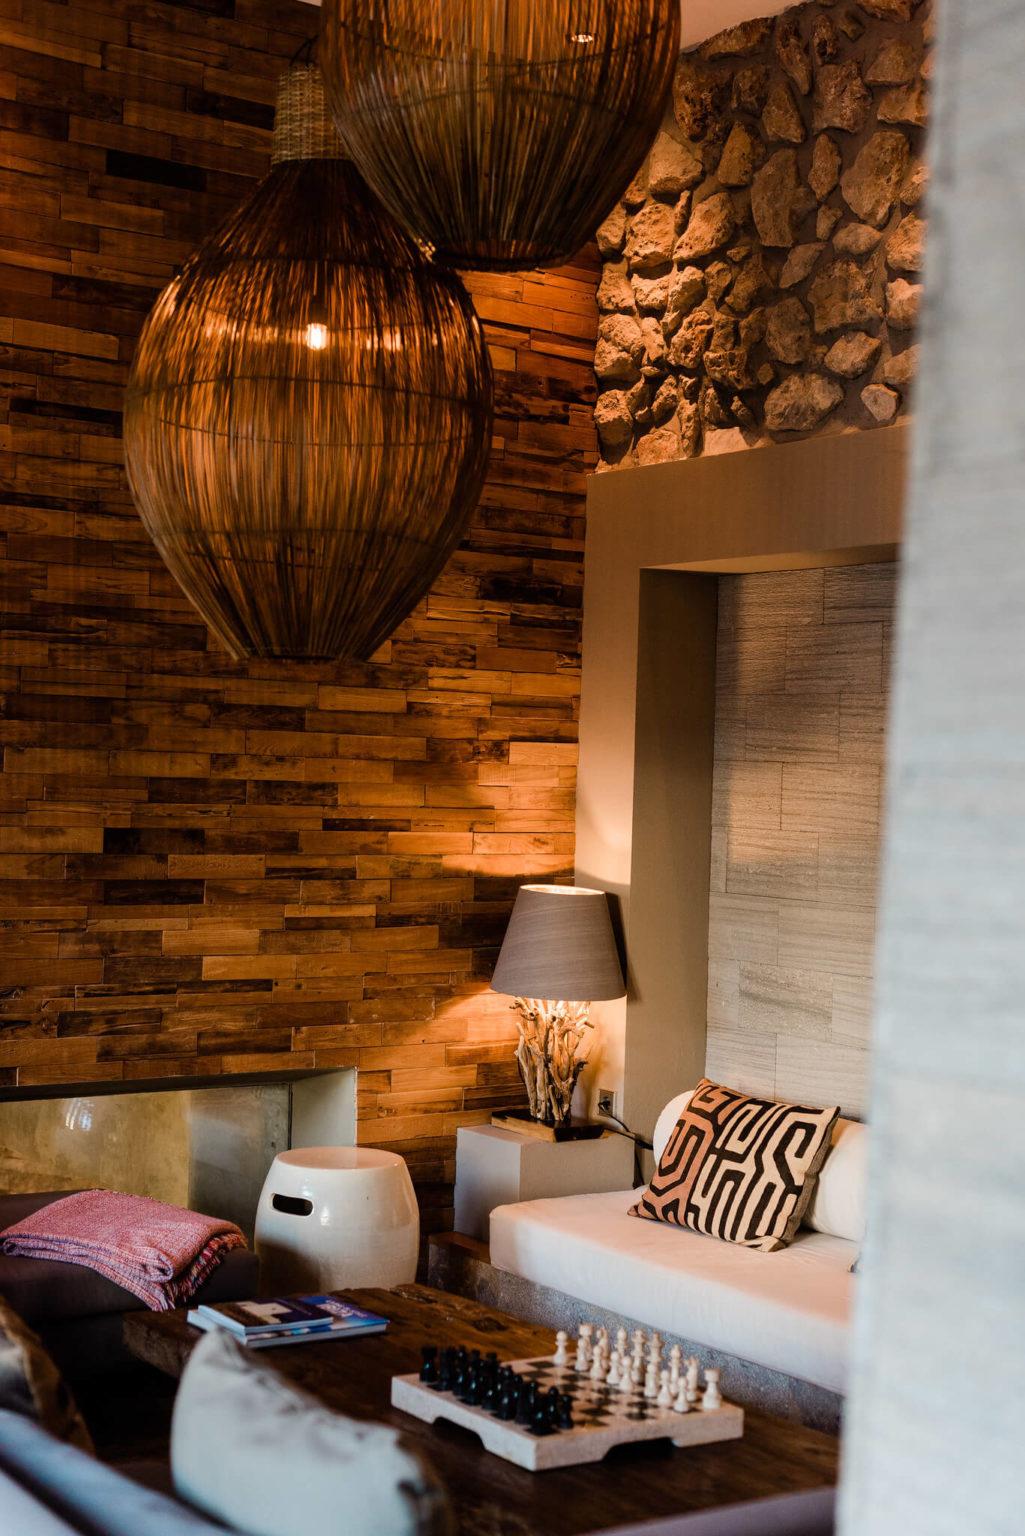 https://www.white-ibiza.com/wp-content/uploads/2020/03/white-ibiza-boutique-hotels-the-giri-residence-2020-11-1025x1536.jpg